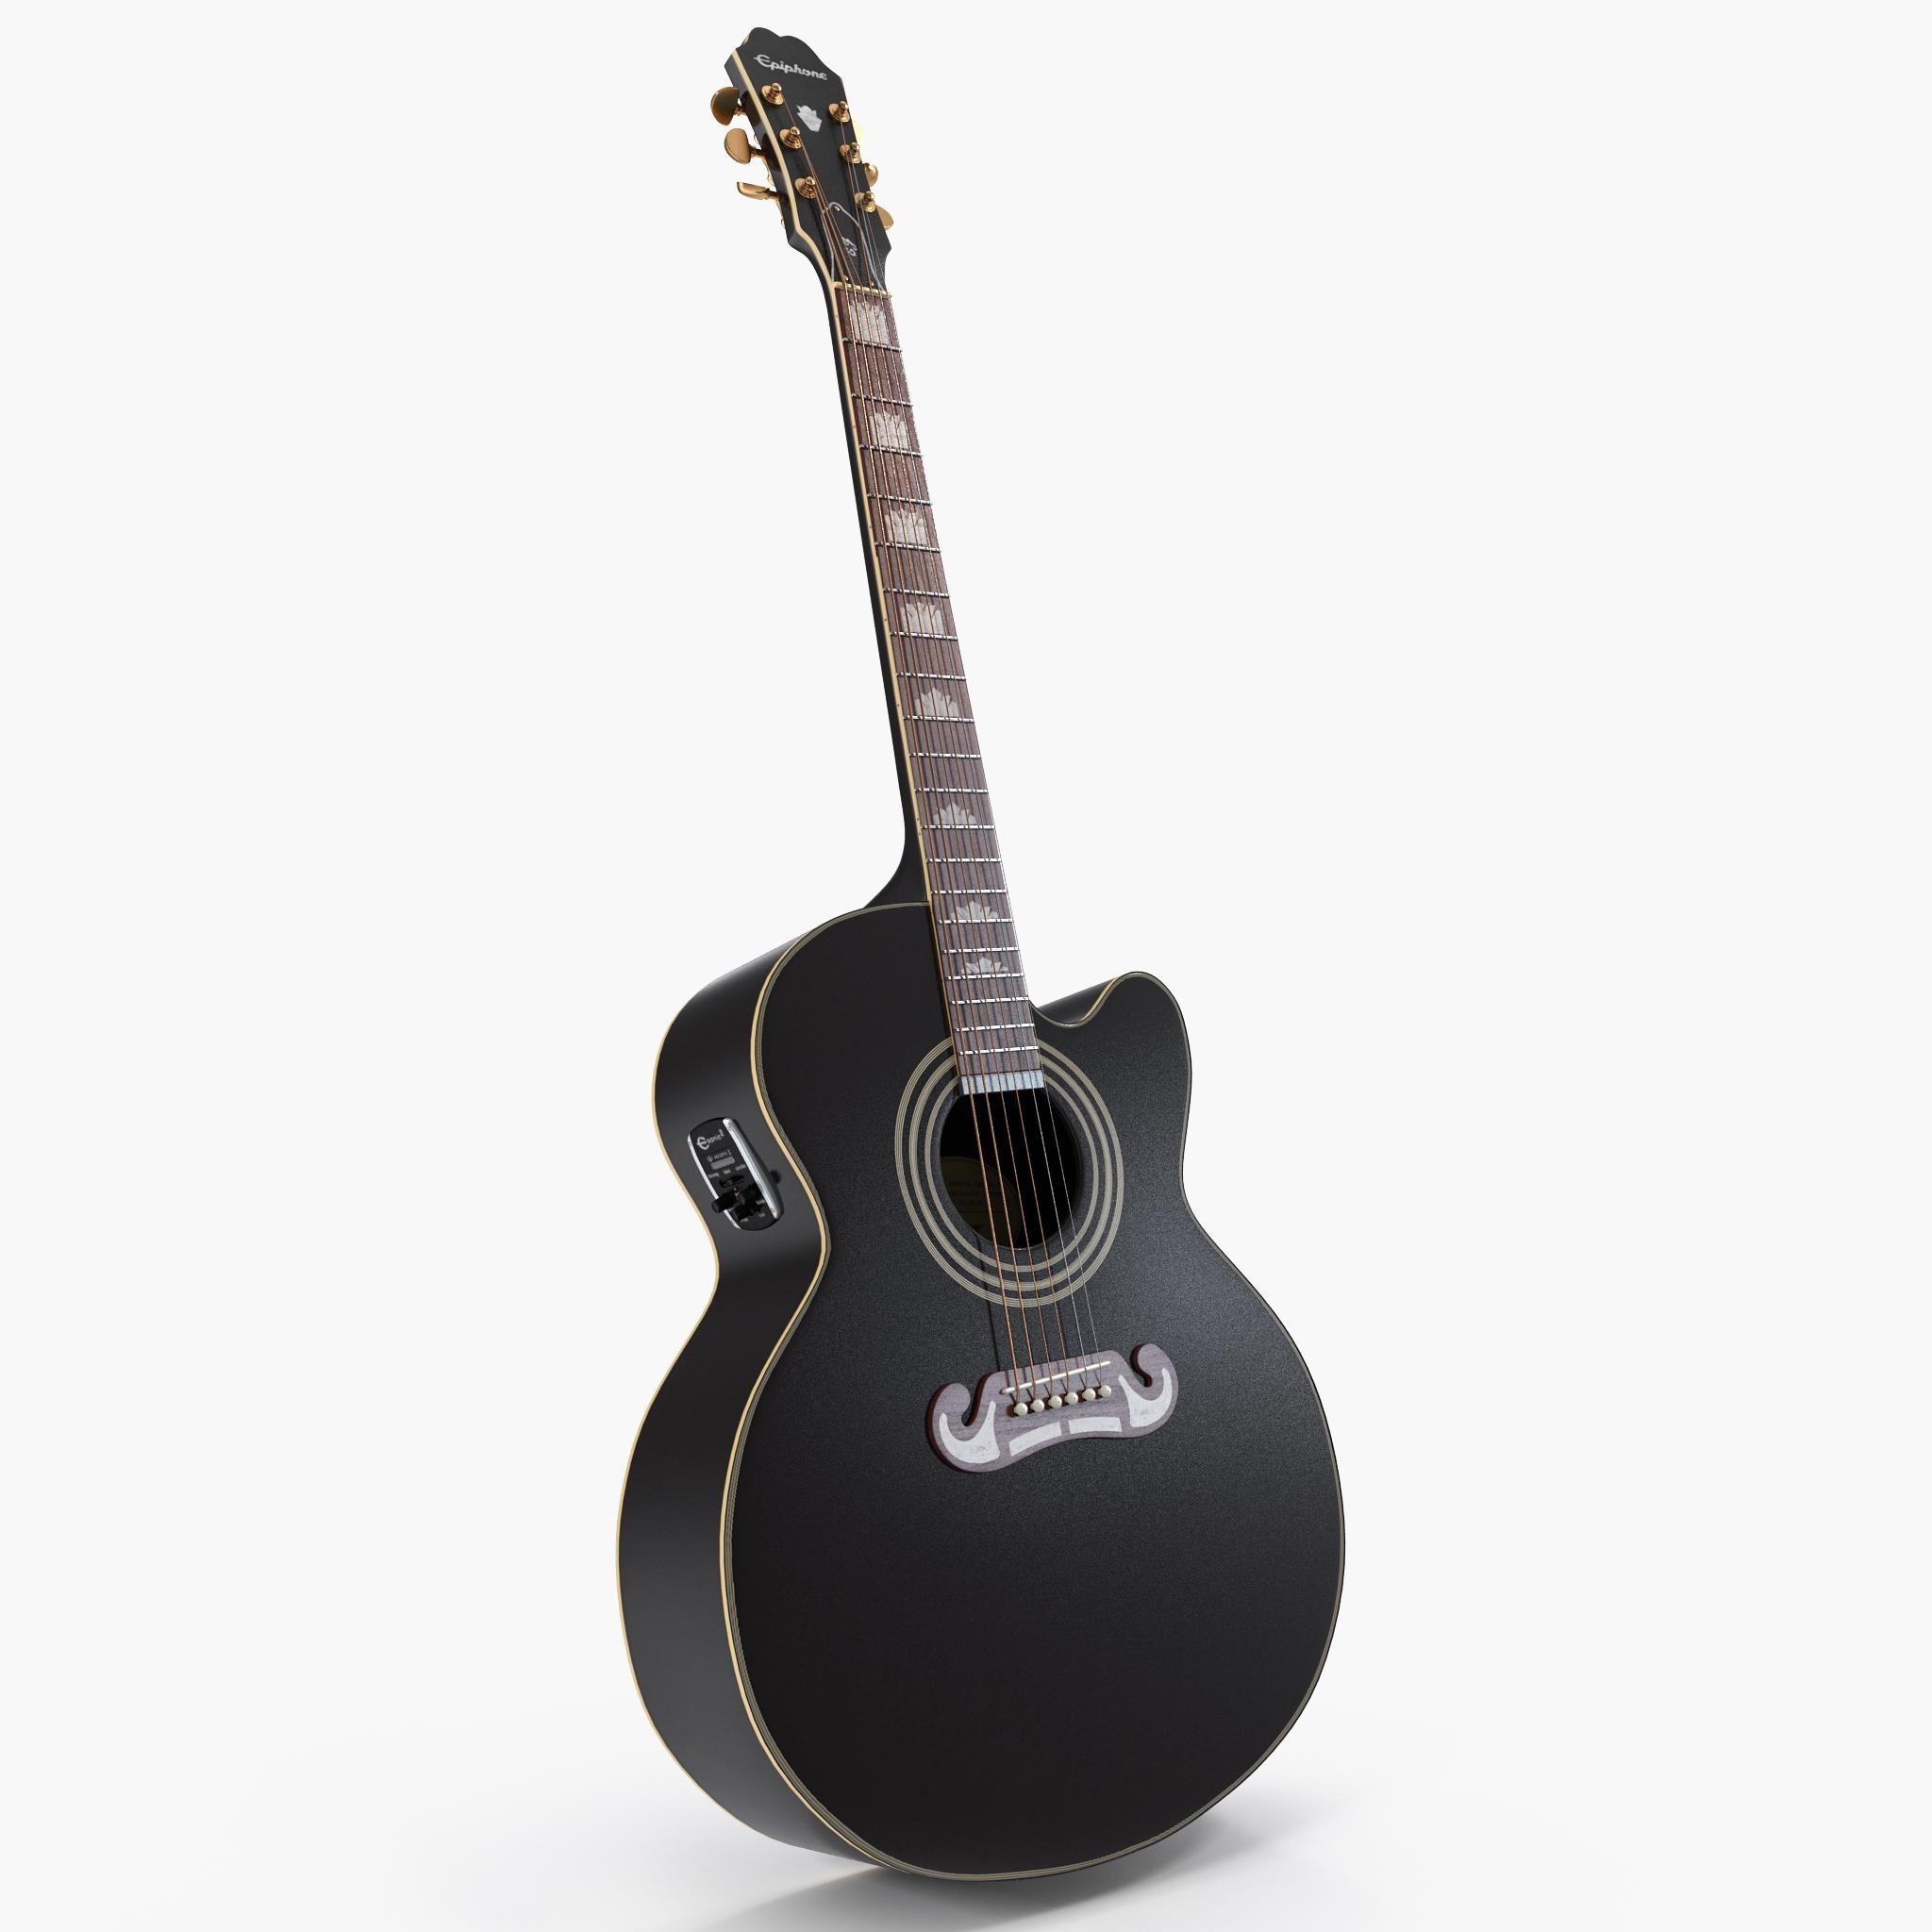 Electro Acoustic Guitar Black 3d Model Ad Acoustic Electro Guitar Model Electro Acoustic Guitar Acoustic Guitar Guitar